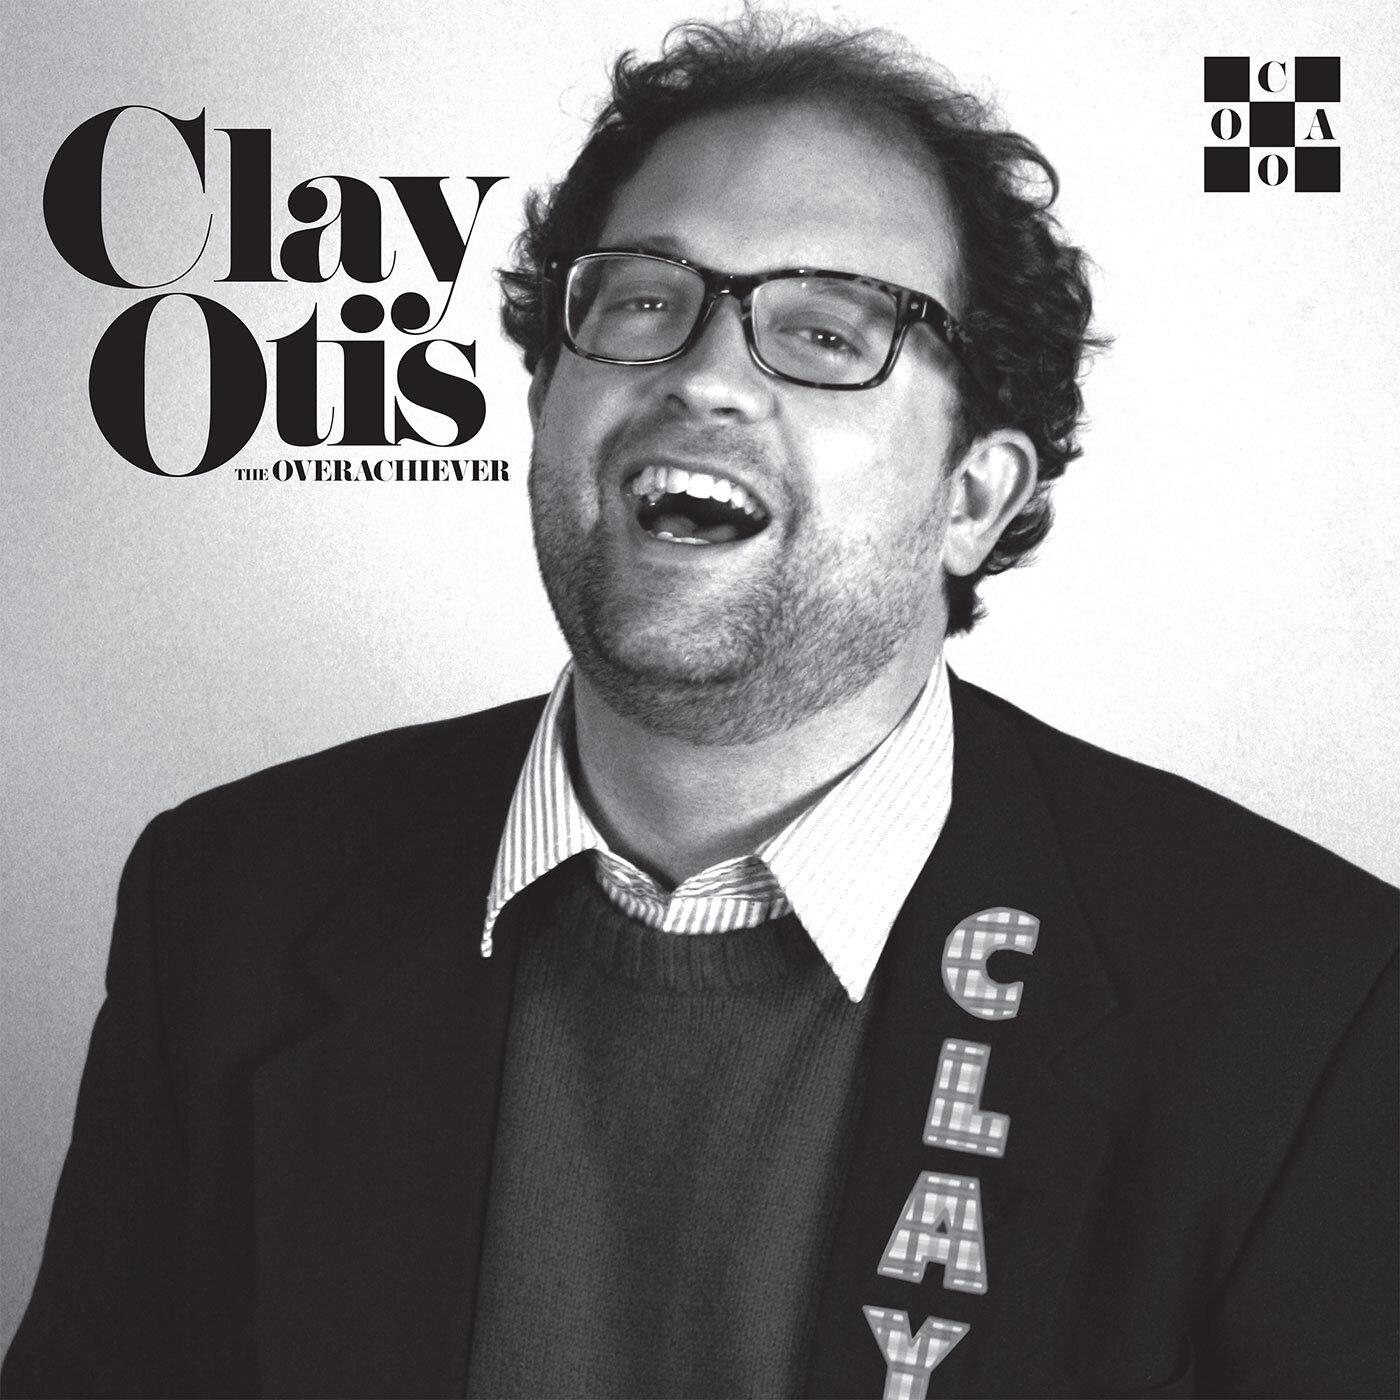 ClayOtis_Overachiever_Final-Cover-1400x1400.jpg